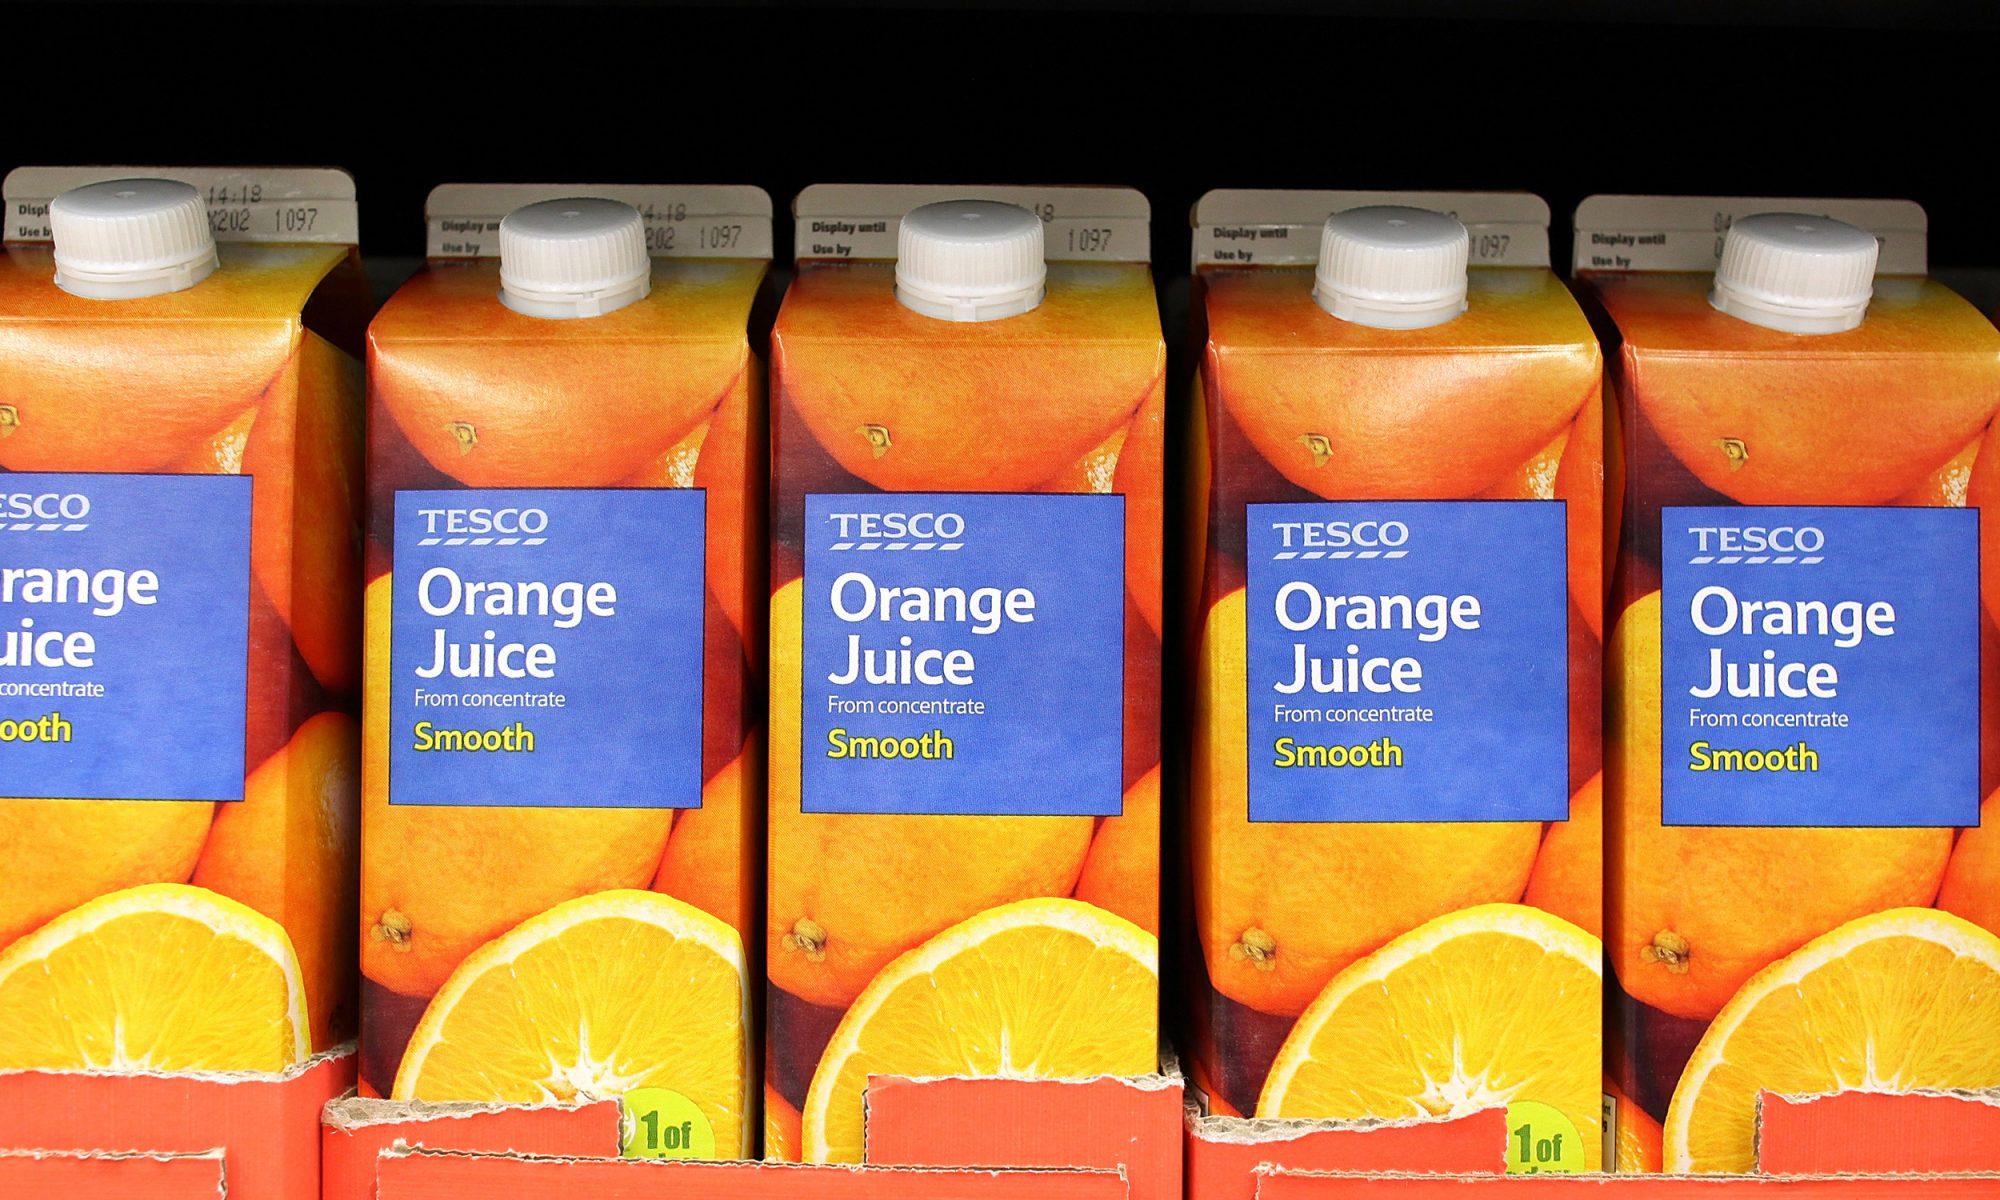 EC: Gang Caught Smuggling Weed in Orange Juice Cartons